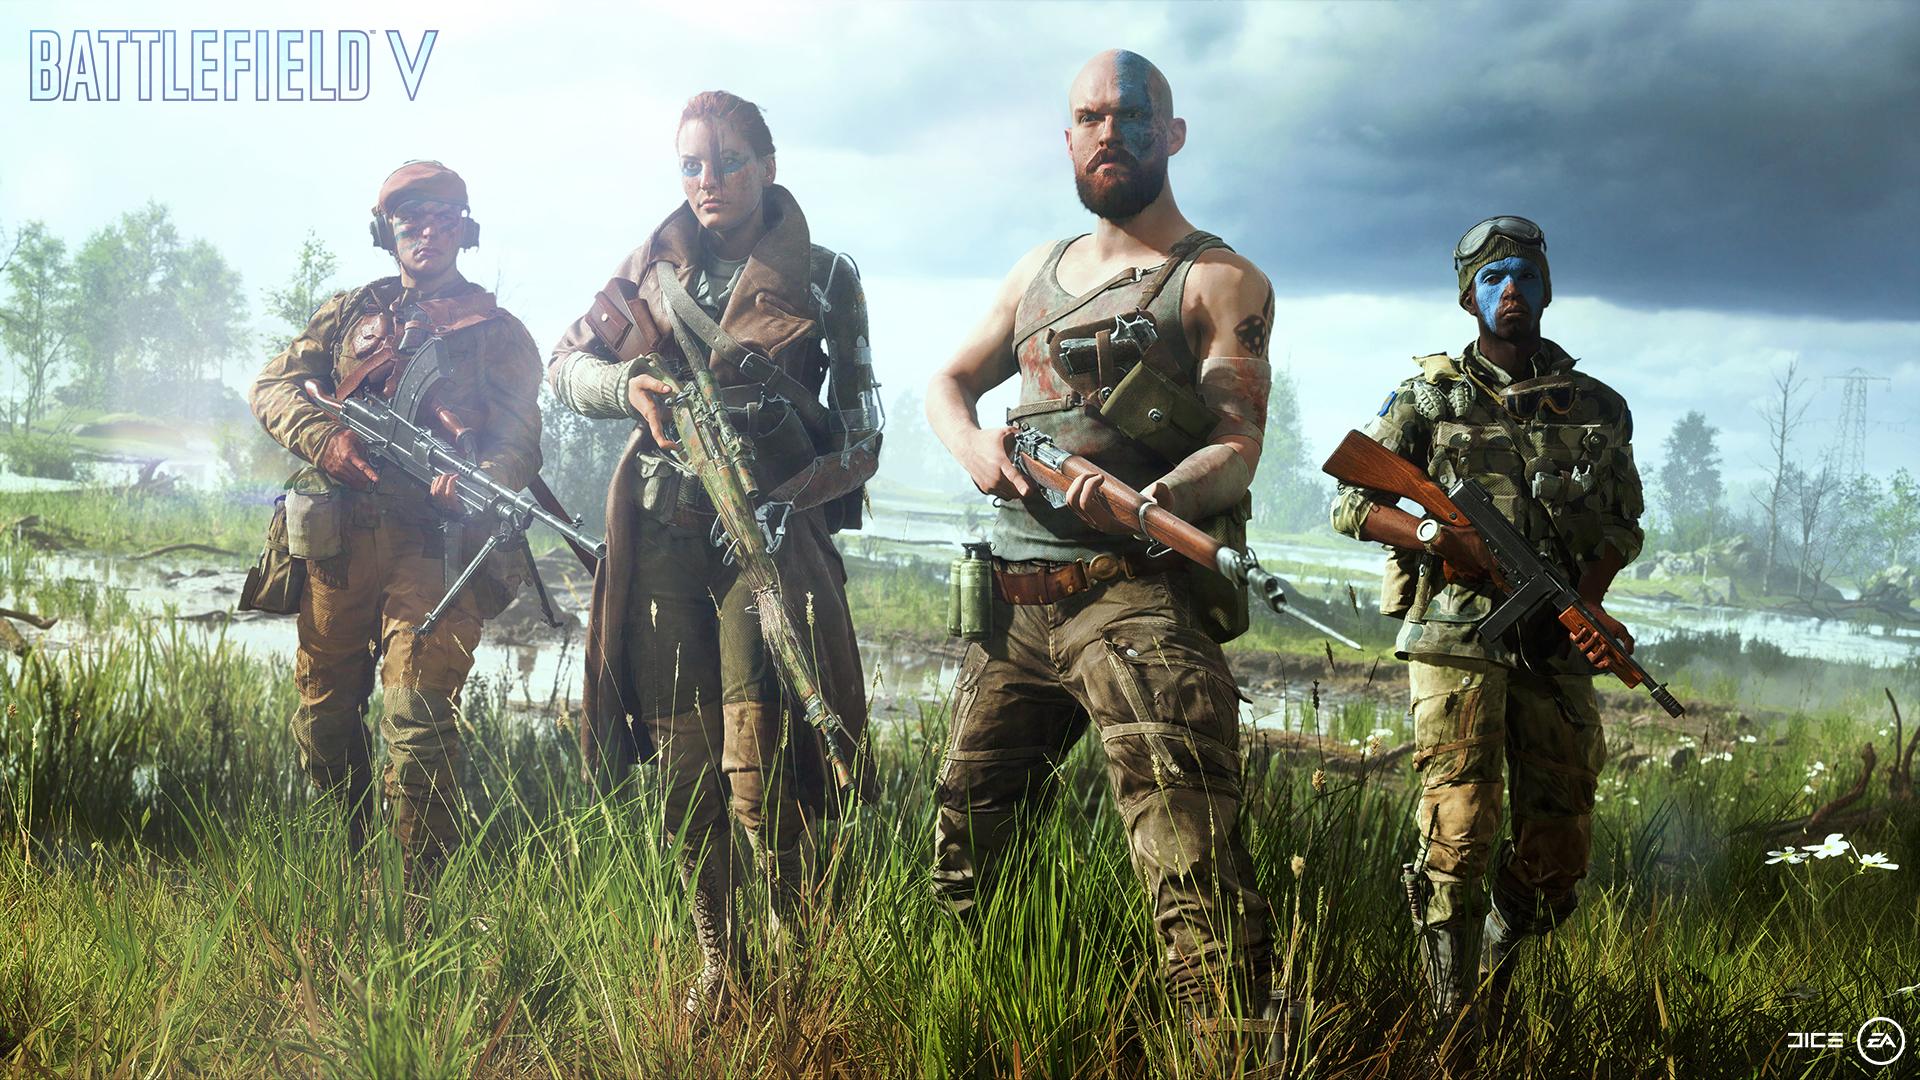 GeForce GTX, The PC Platform of Battlefield V